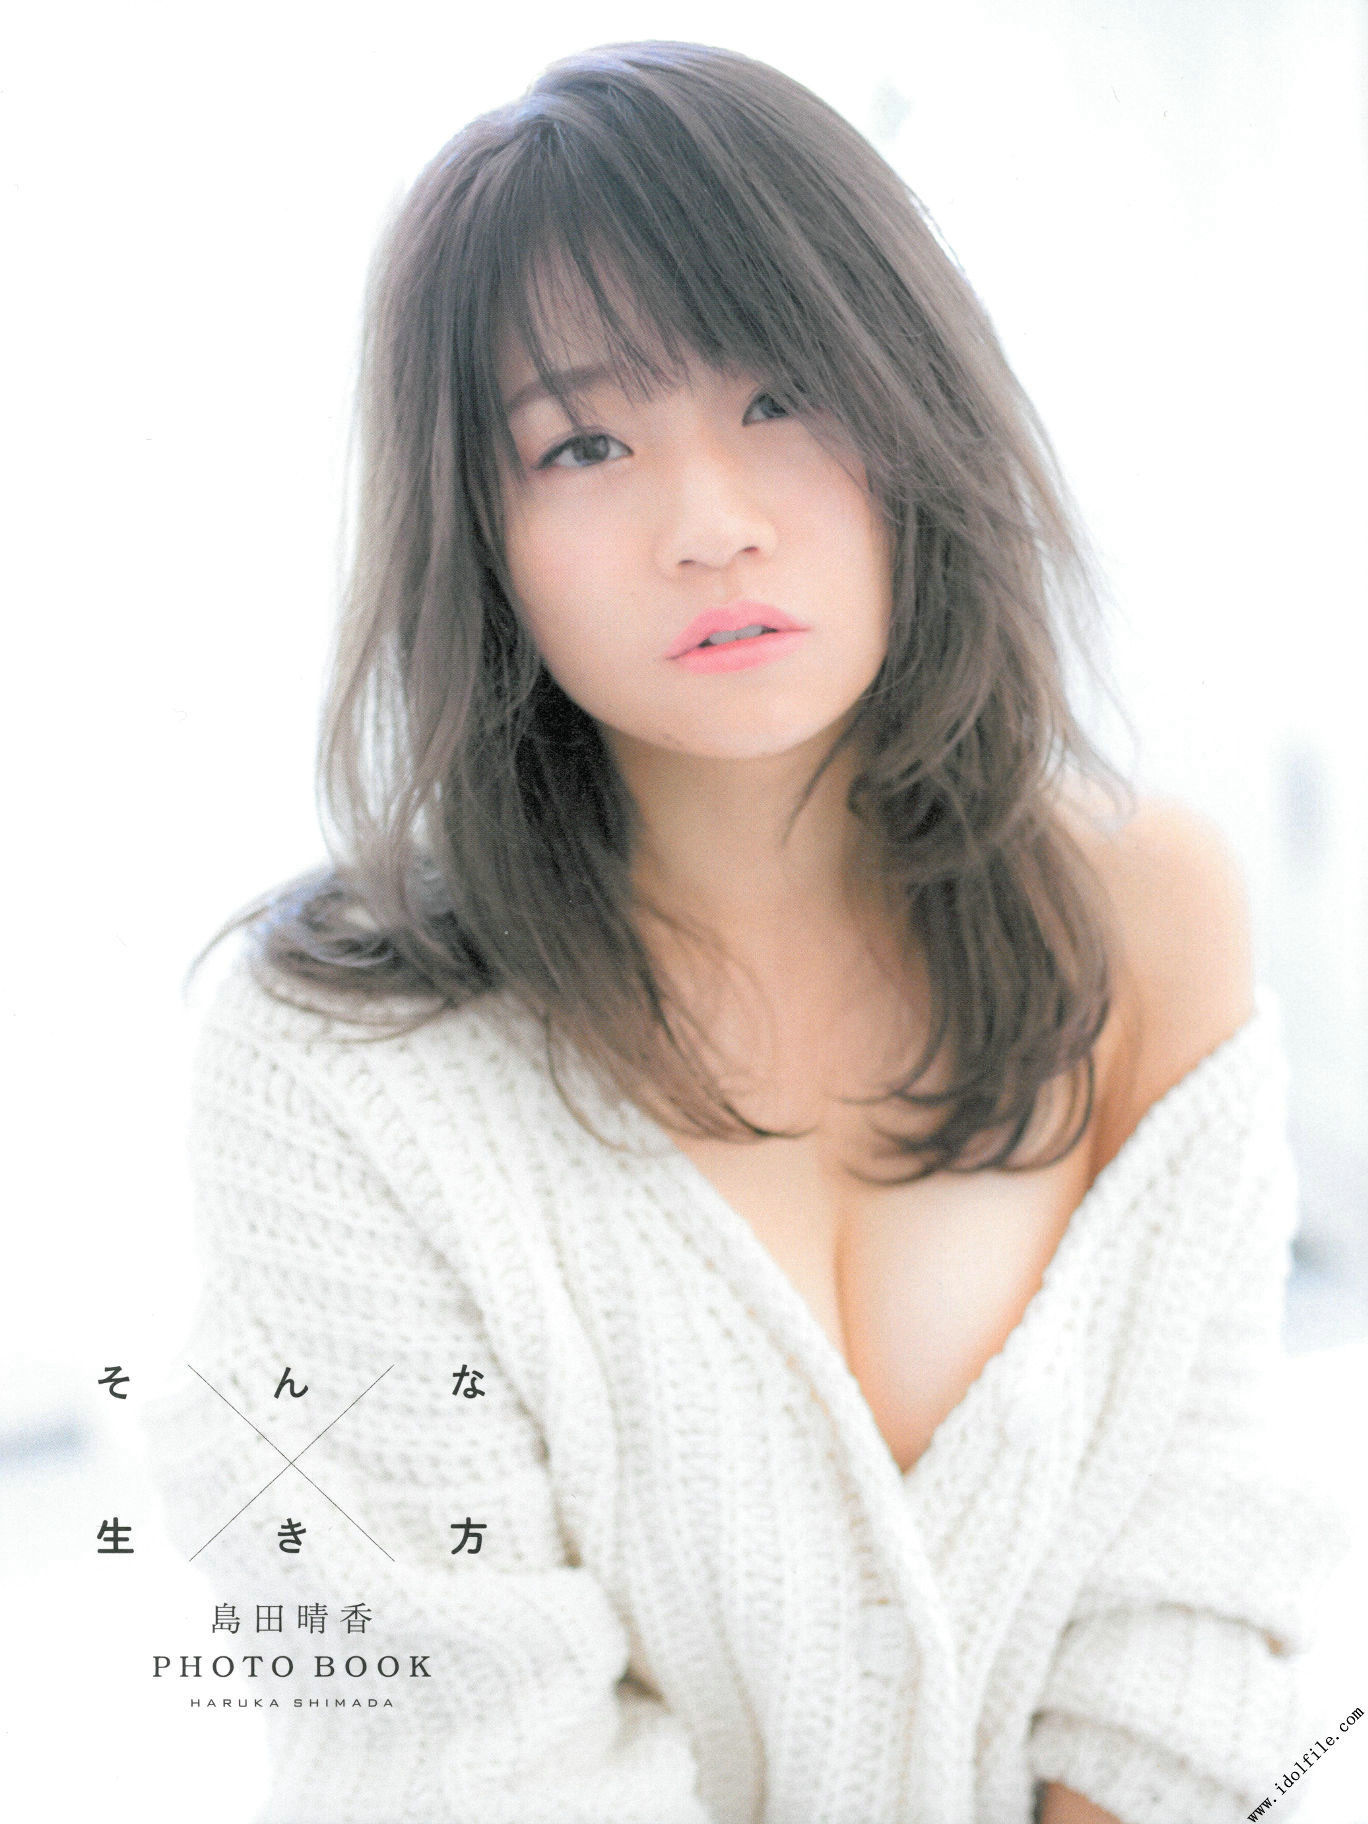 VOL.385 [PB集]清纯唯美日本嫩模:岛田晴香(島田晴香)超高清写真套图(83P)